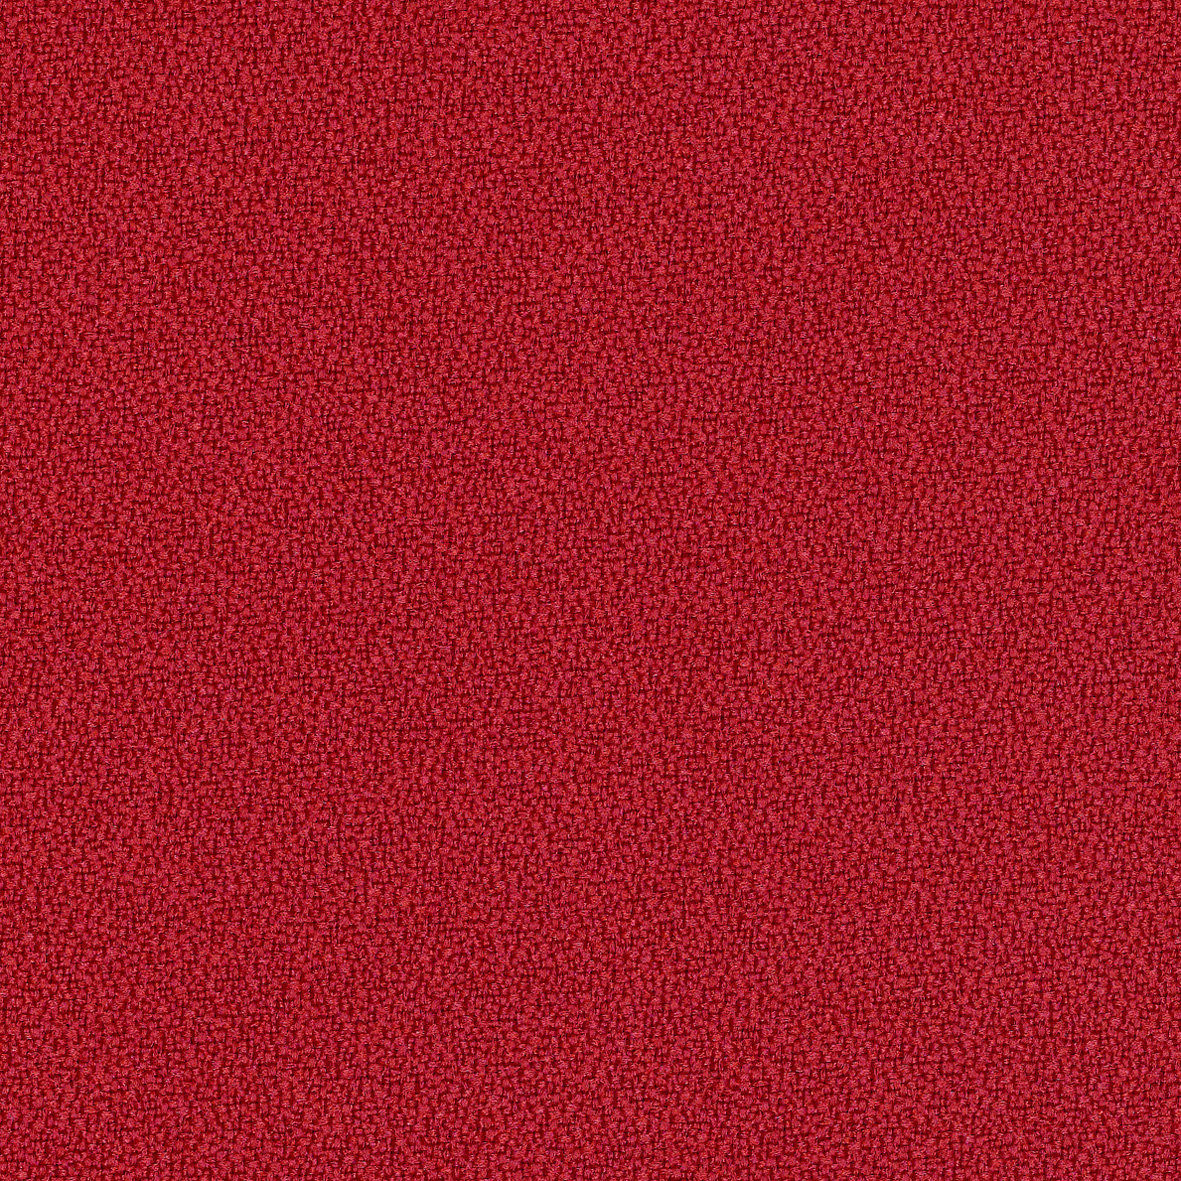 Softline bordskærmvæg rød B1200xH590 mm